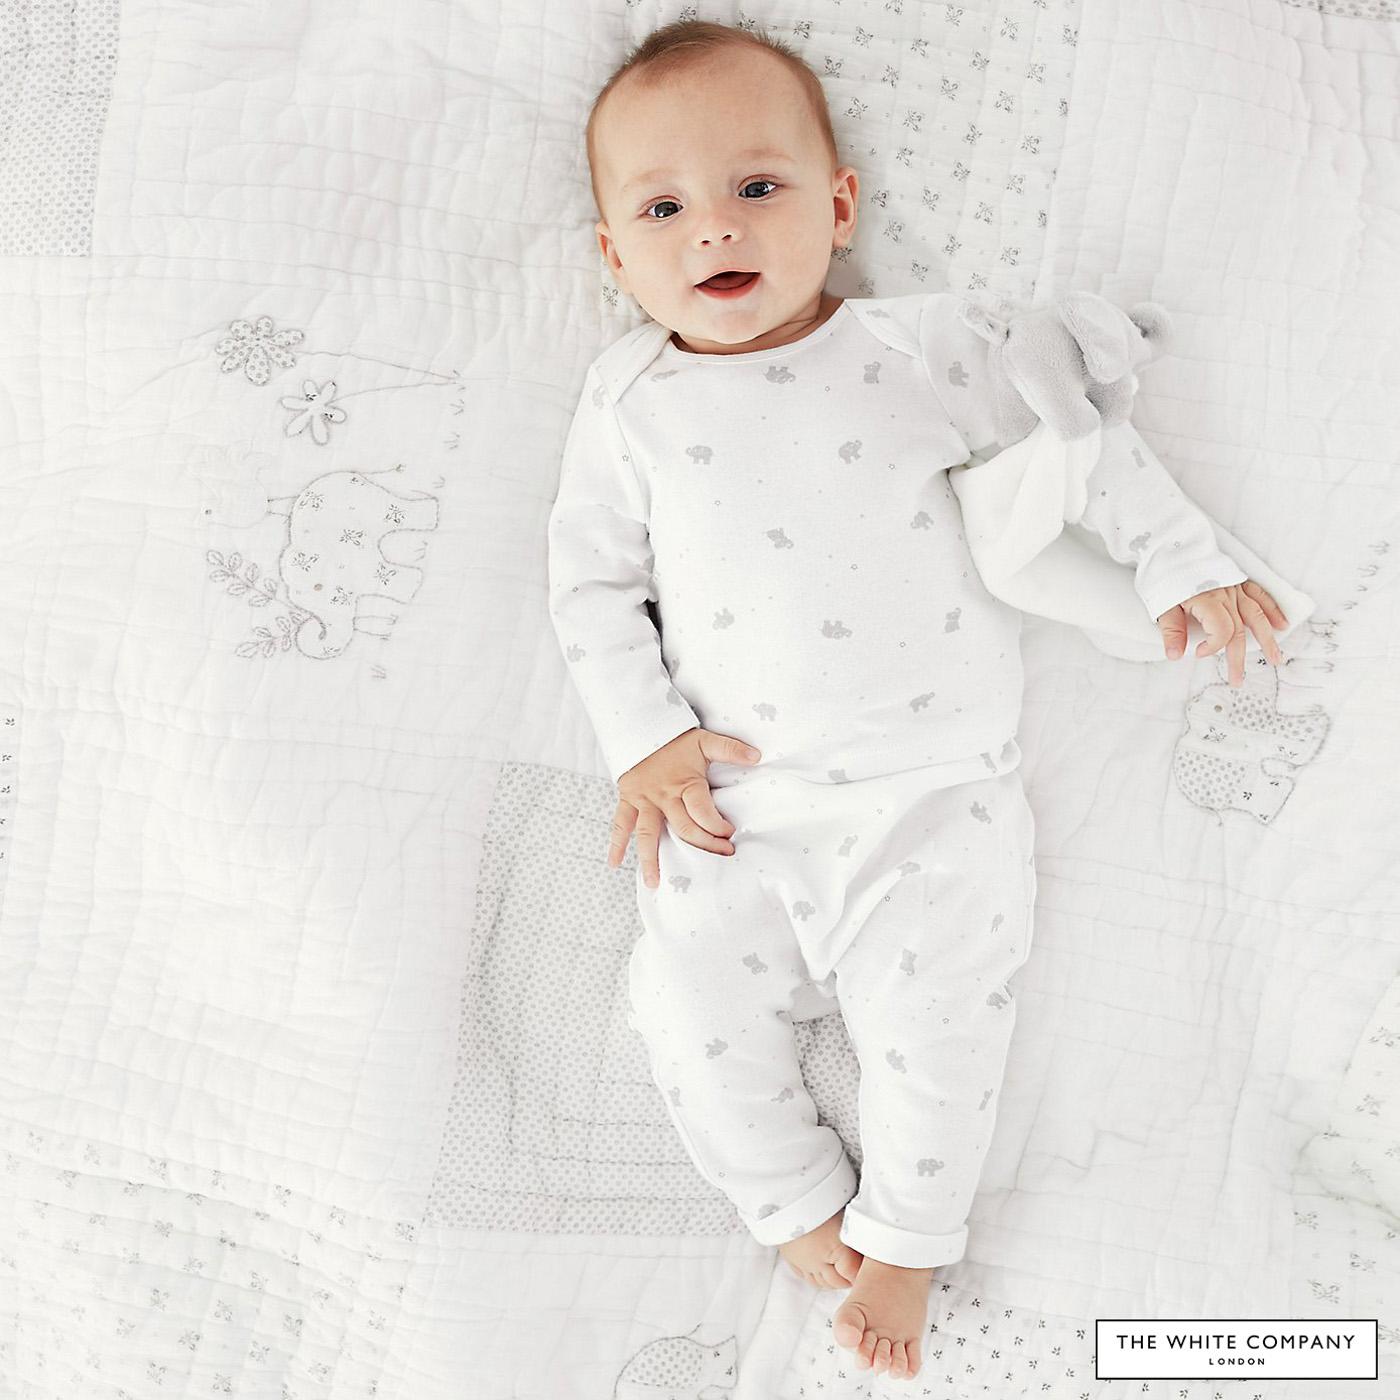 Babies page003.jpg